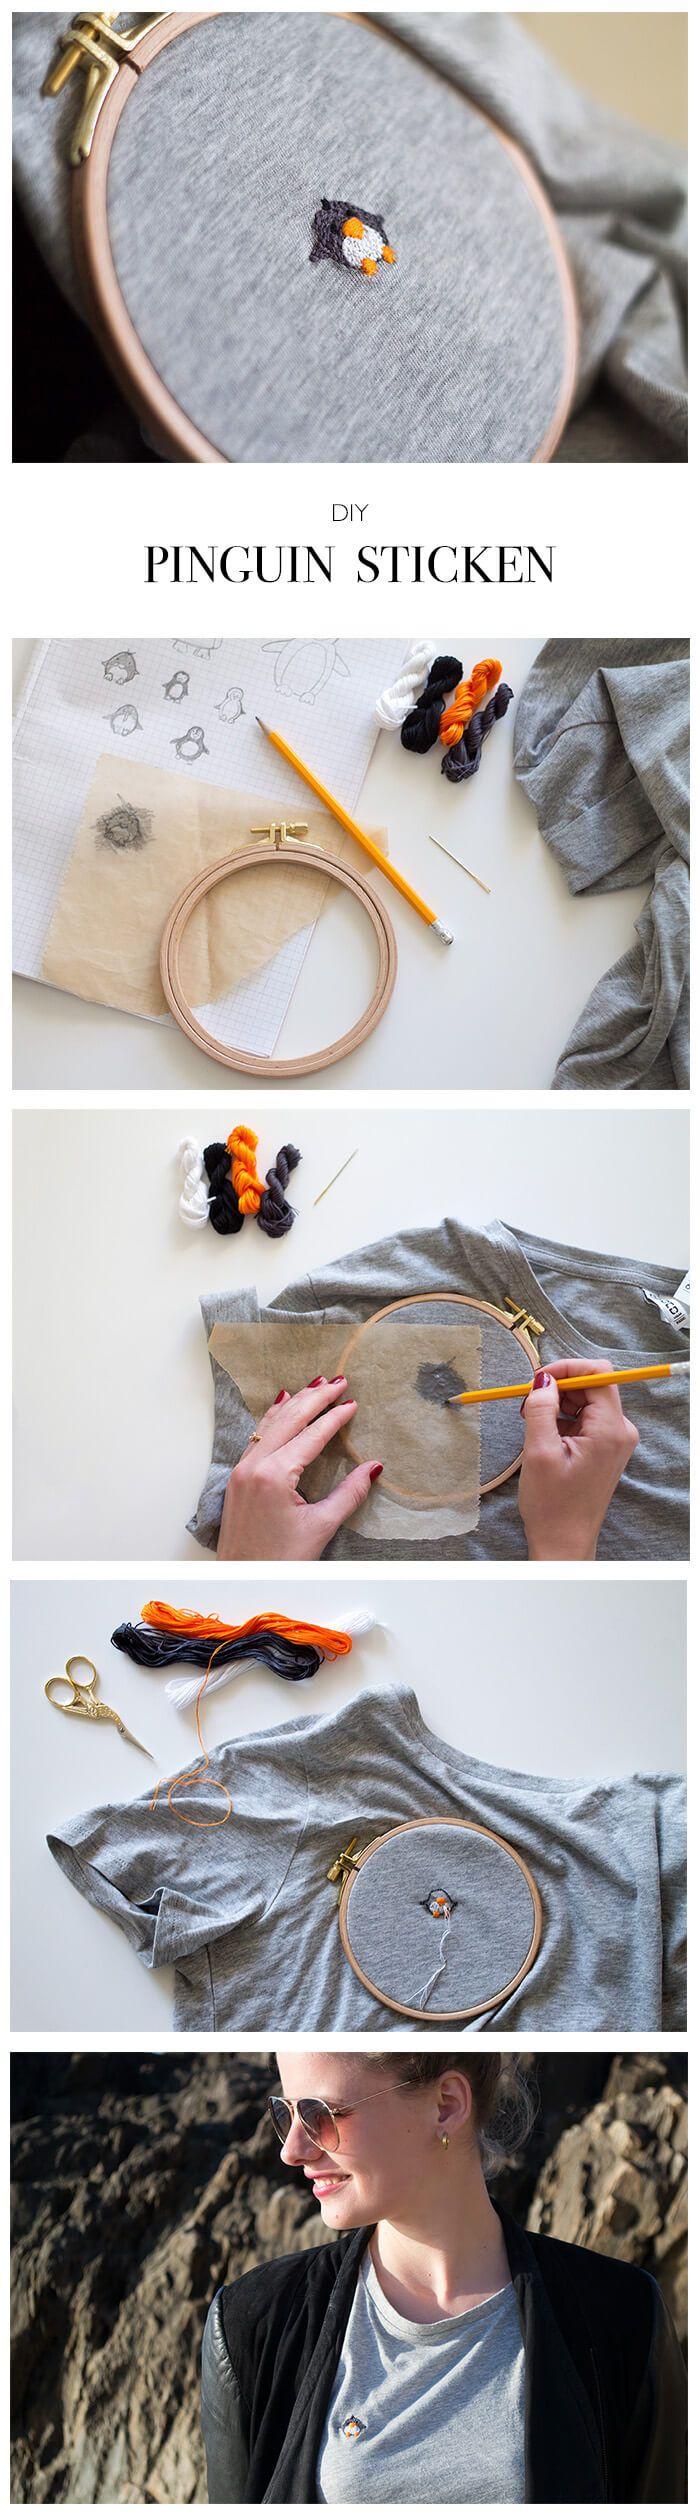 Pinguin sticken - DIY Blog lindaloves.de